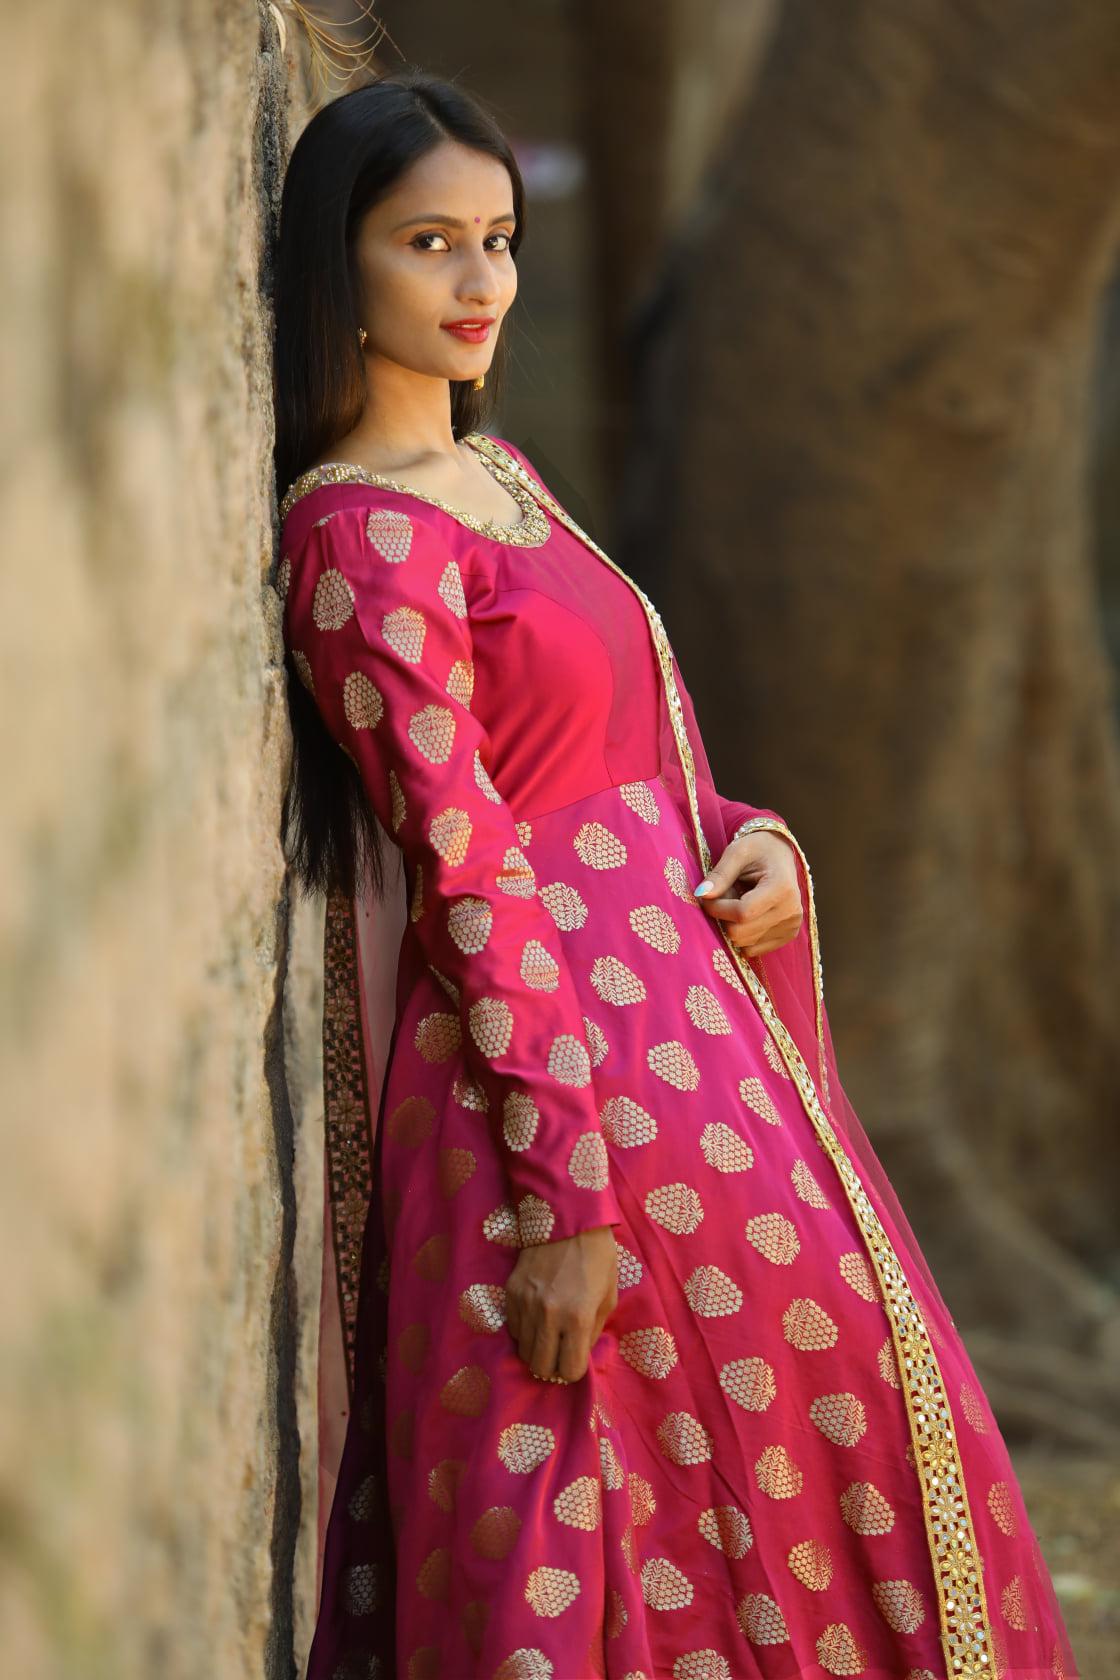 Stunning pink color designer floor length anarkali dress with net dupatta and full sleeves. 2021-03-18